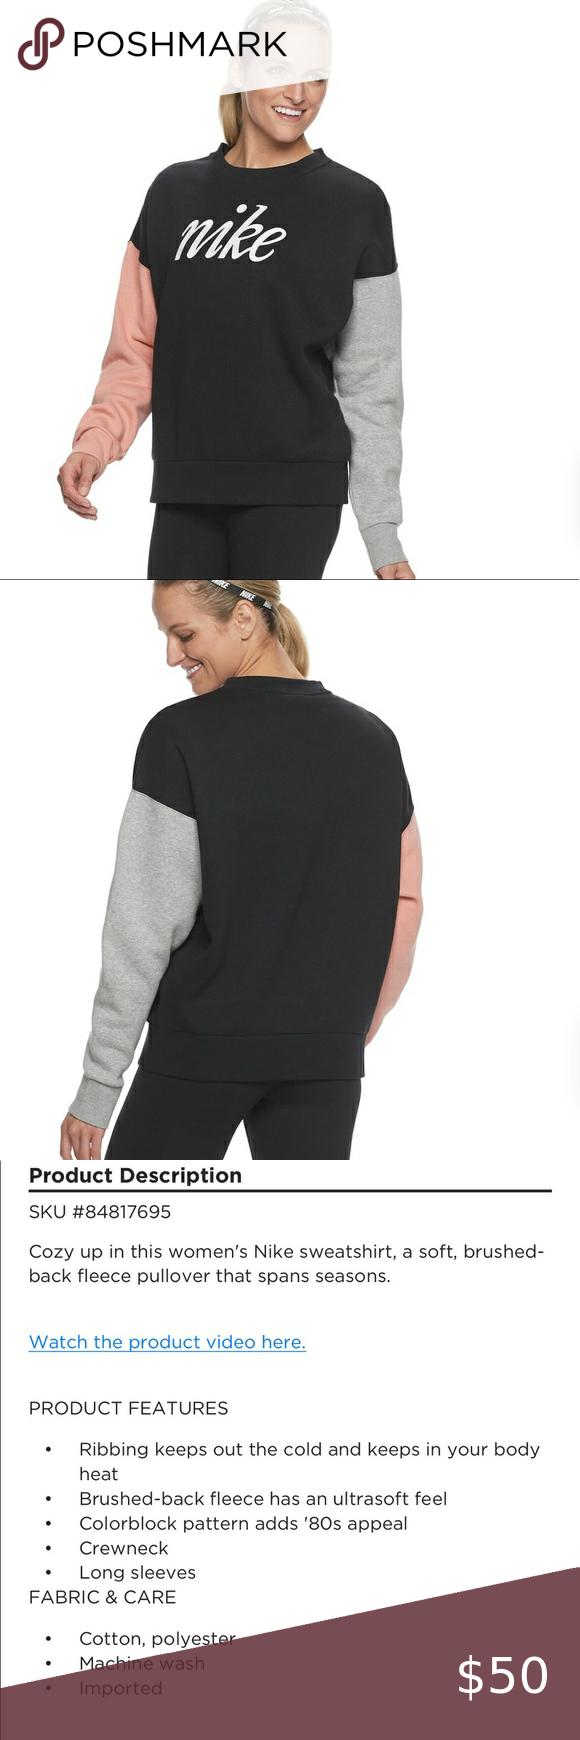 Nike Sweatshirt Nwt In 2020 Nike Women Sweatshirt Nike Sweatshirts Color Block Sweatshirt [ 1740 x 580 Pixel ]